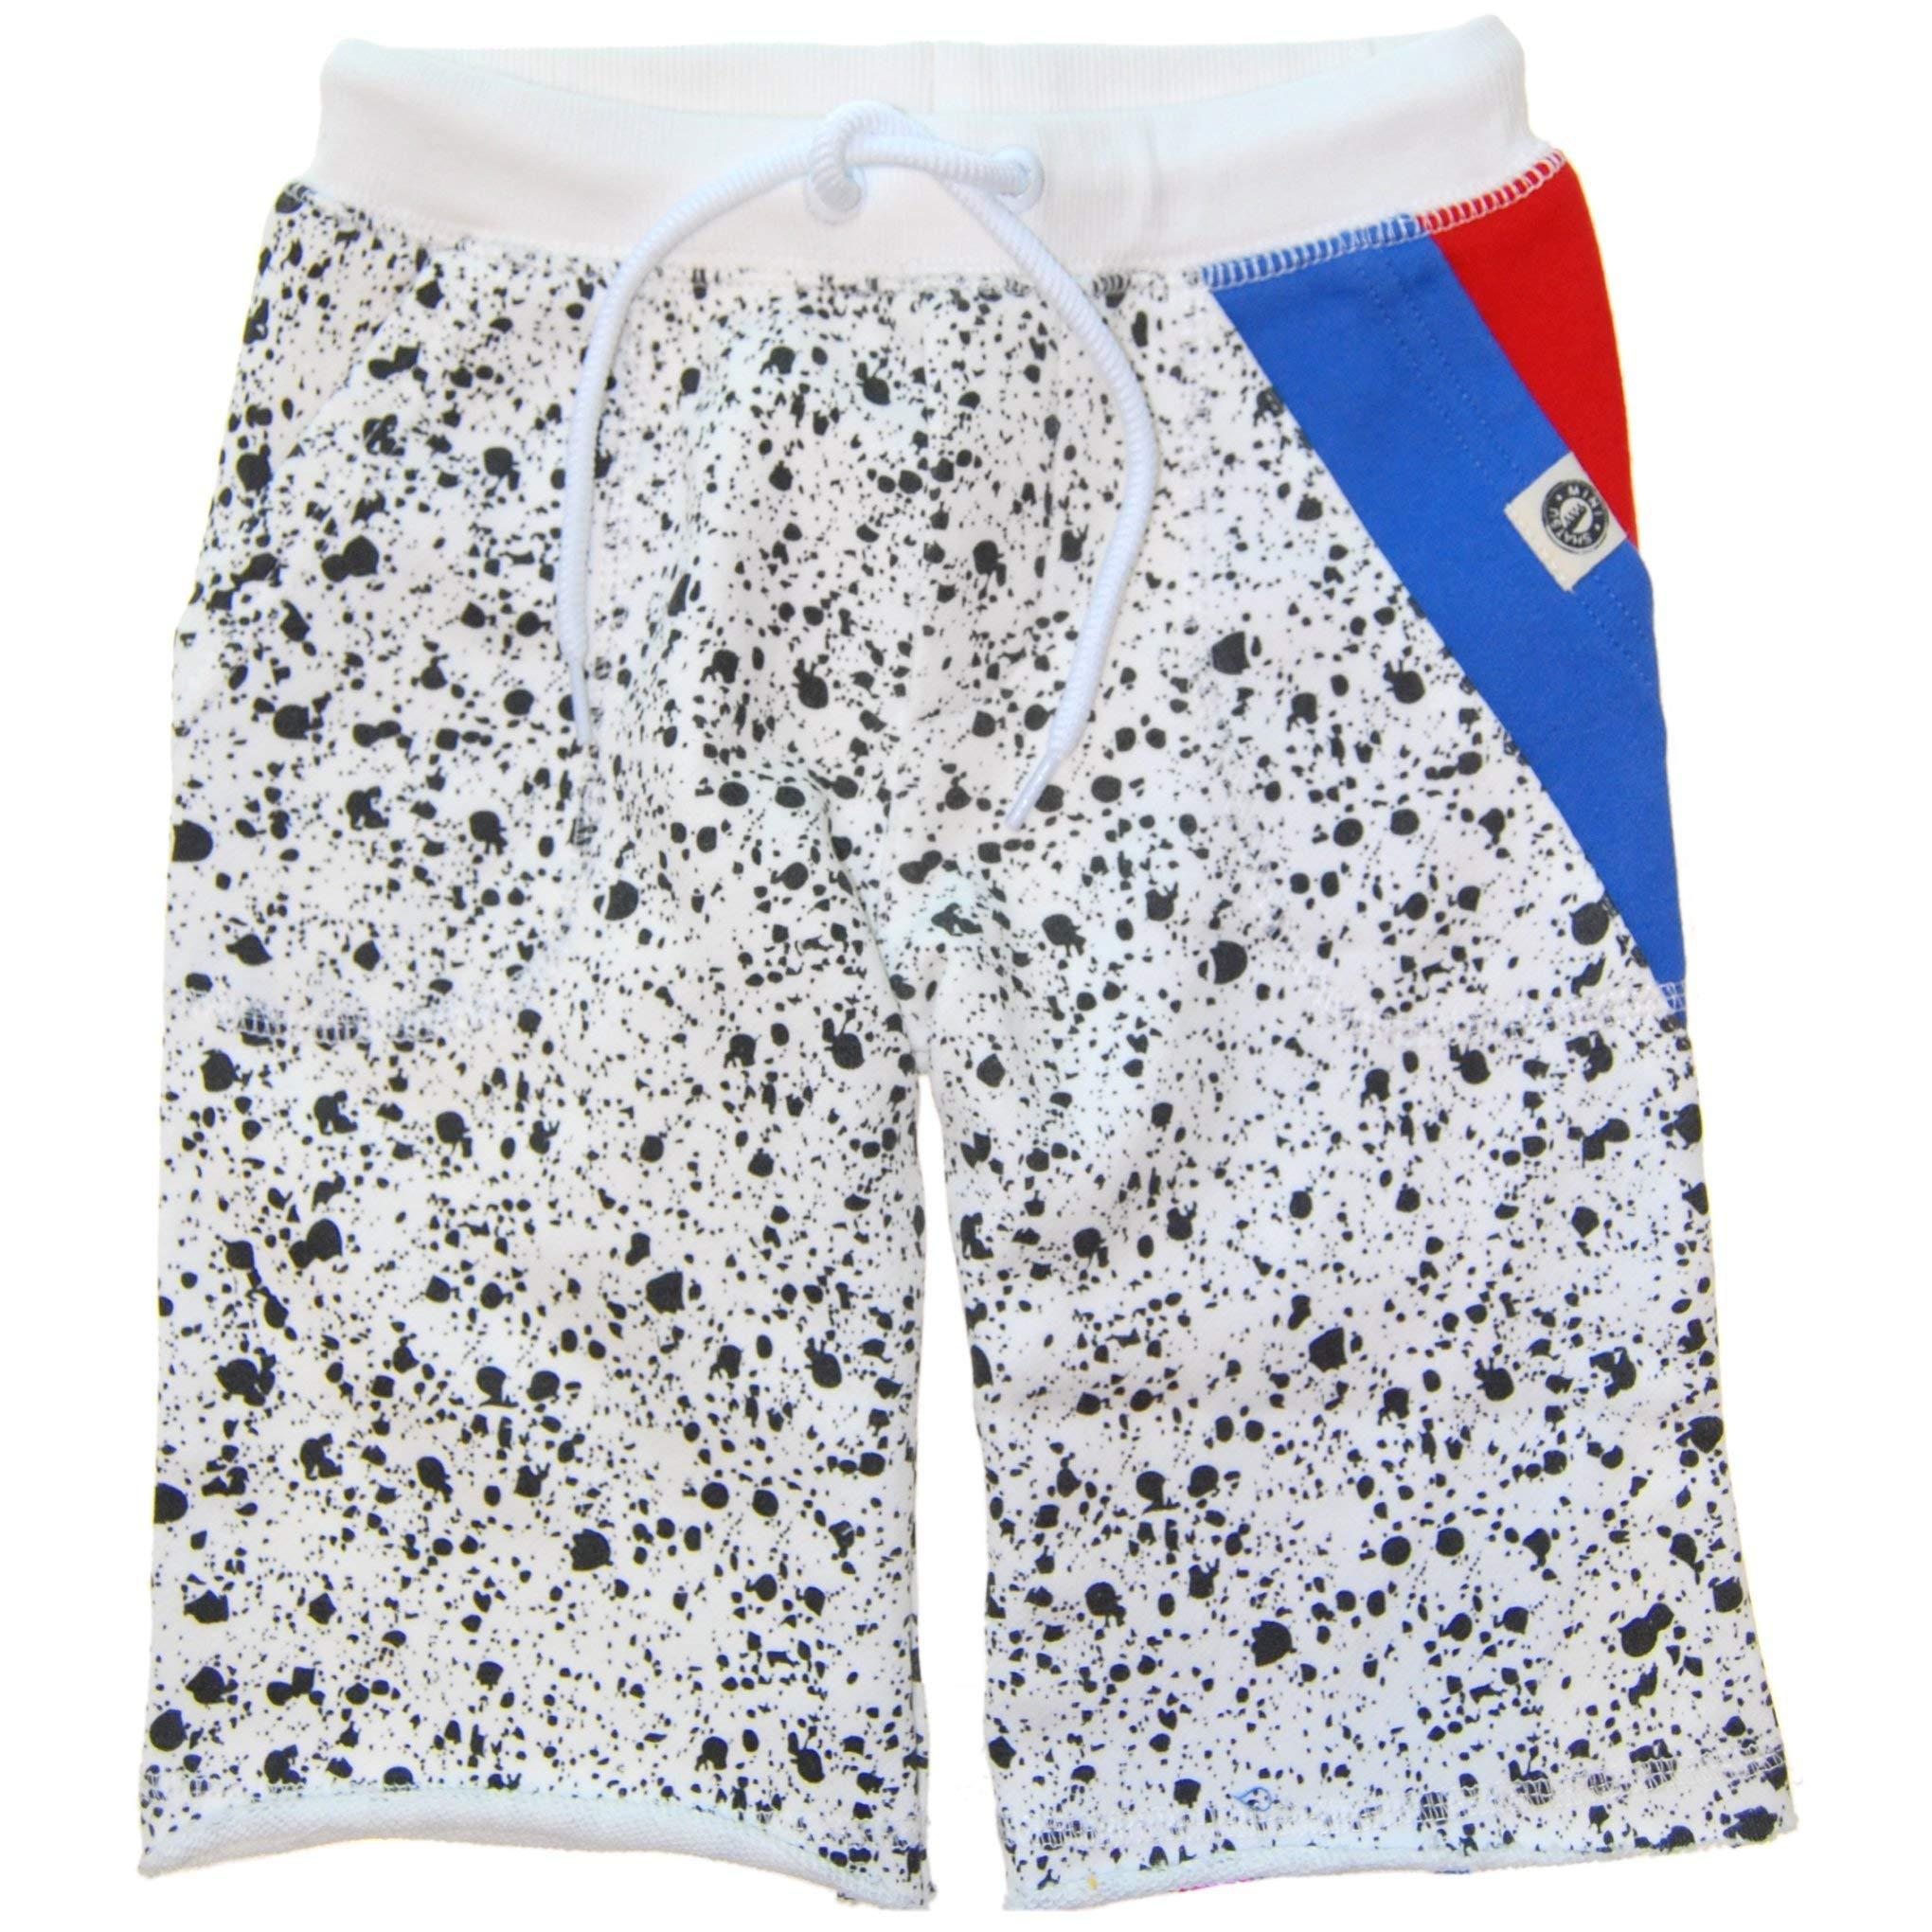 Mini Shatsu Vintage Splatter Shorts